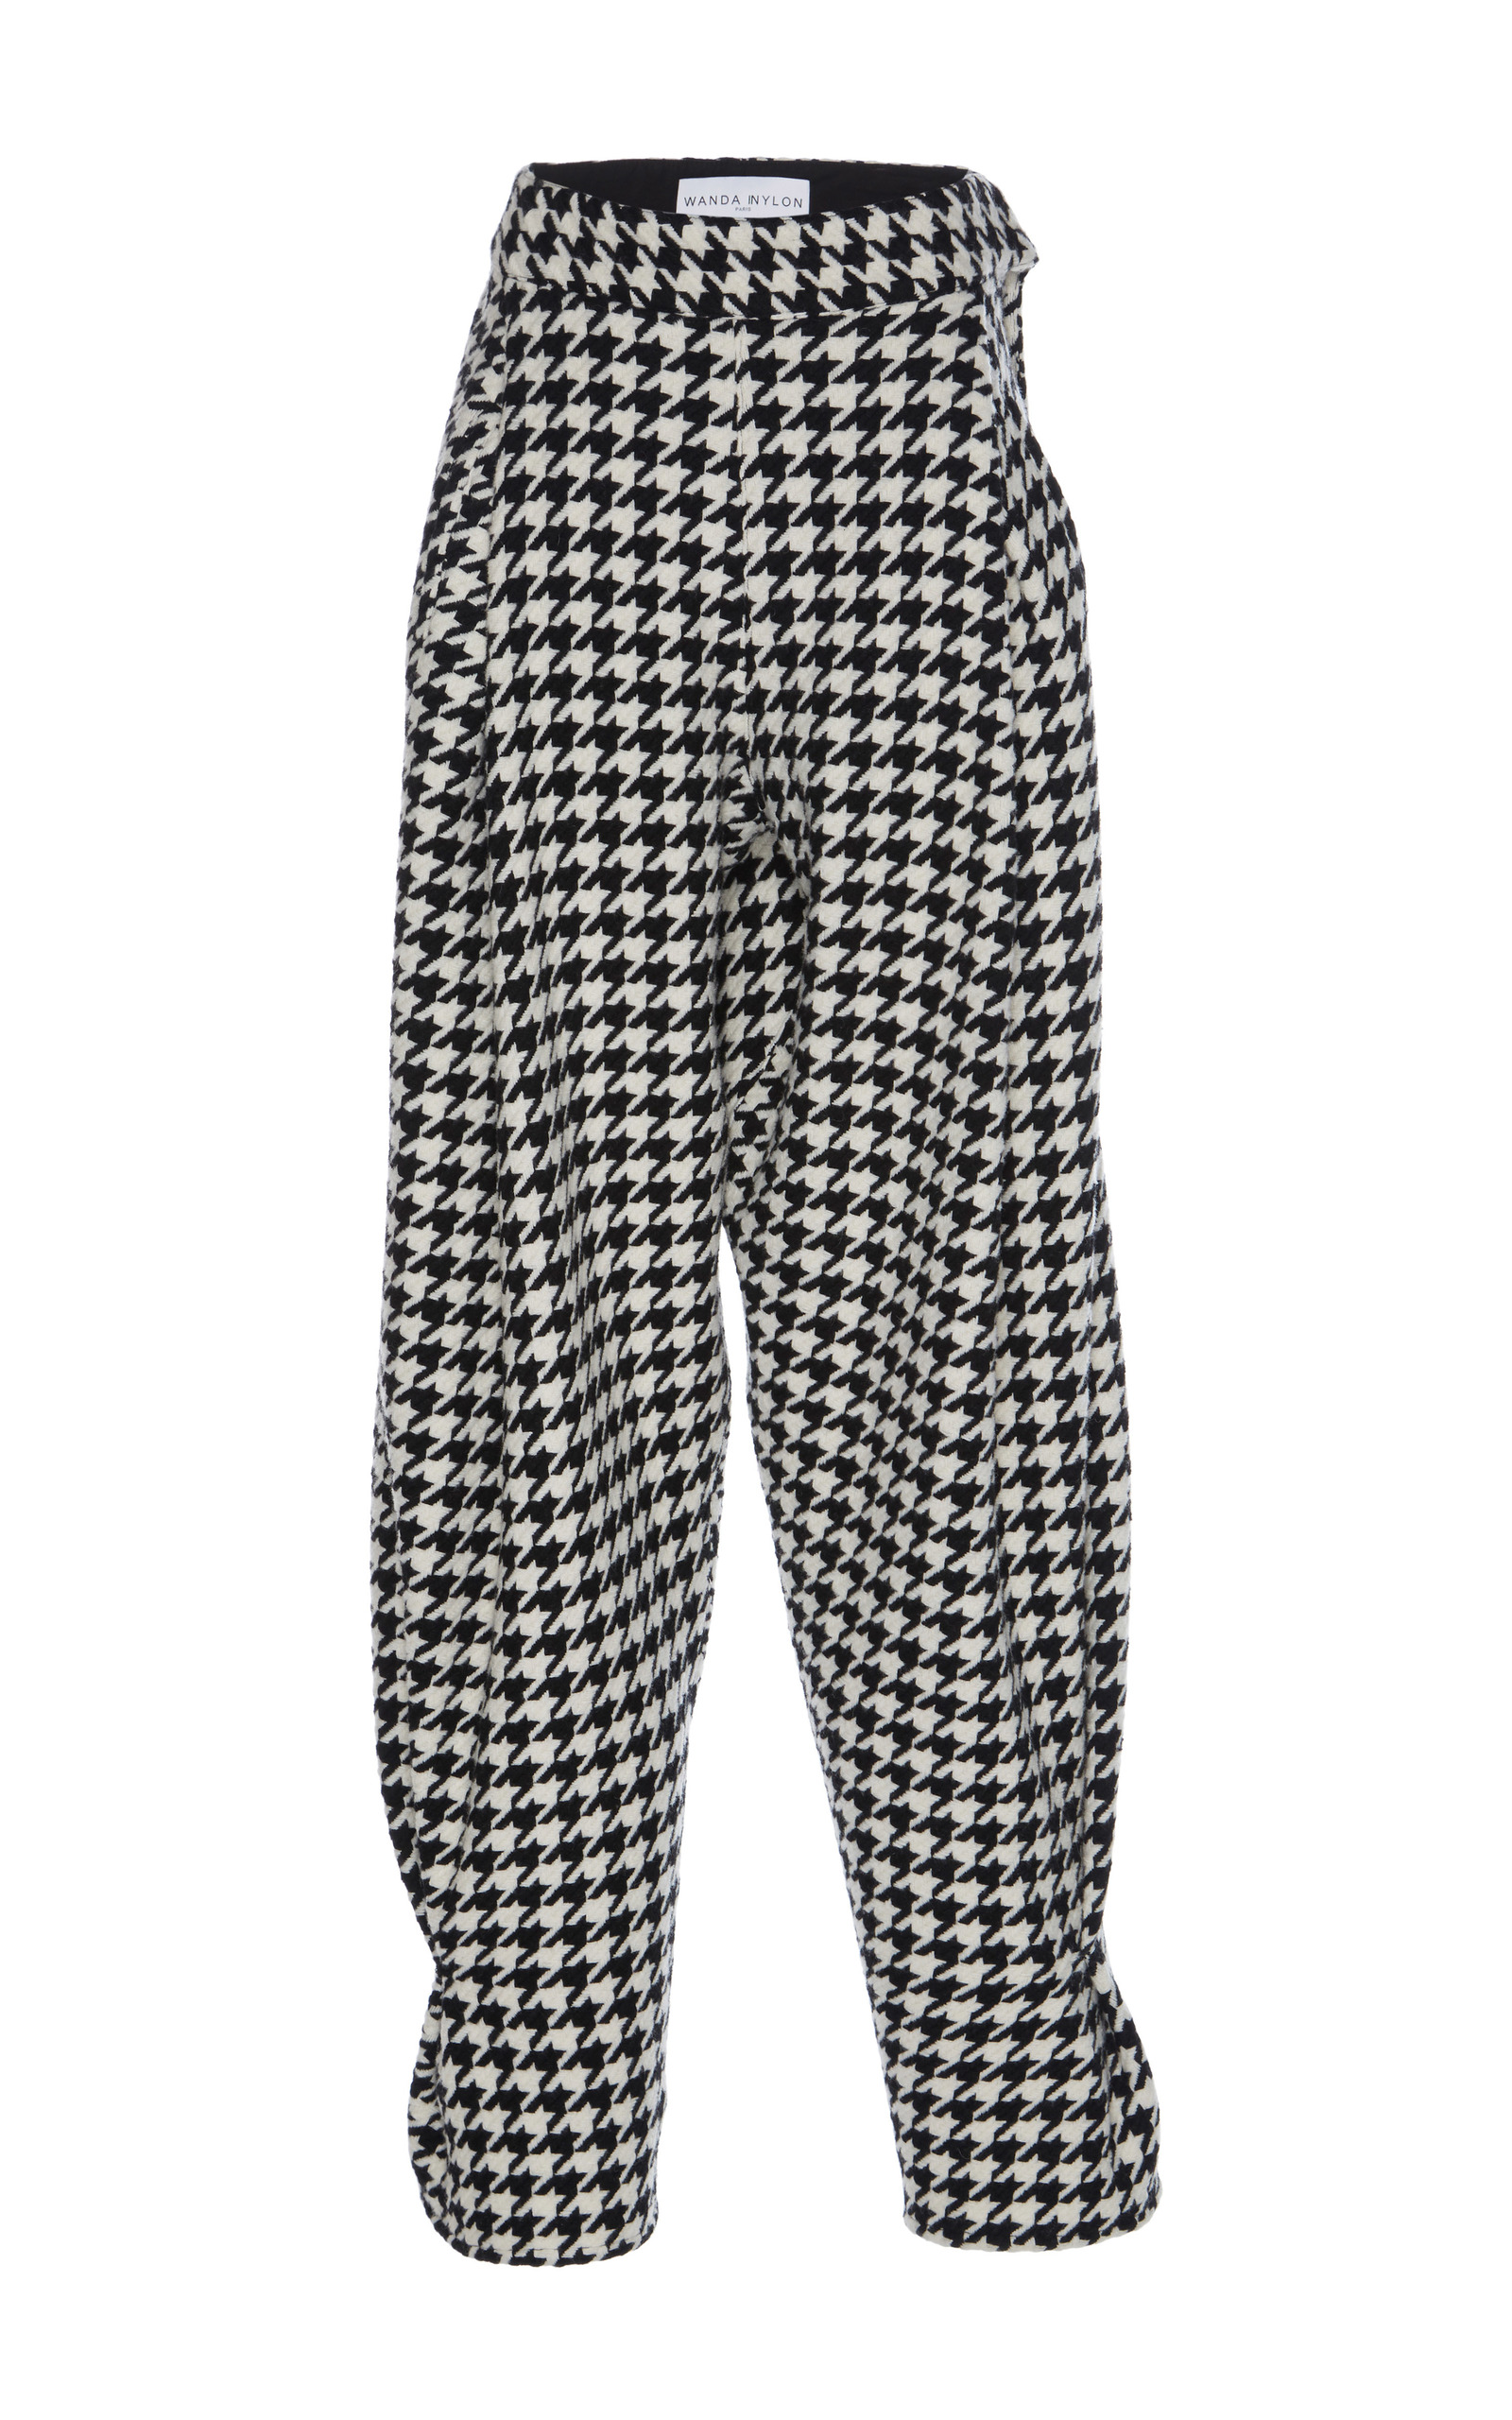 4373cc9faca901 Houndstooth Check Harem Pants by Wanda Nylon | Moda Operandi